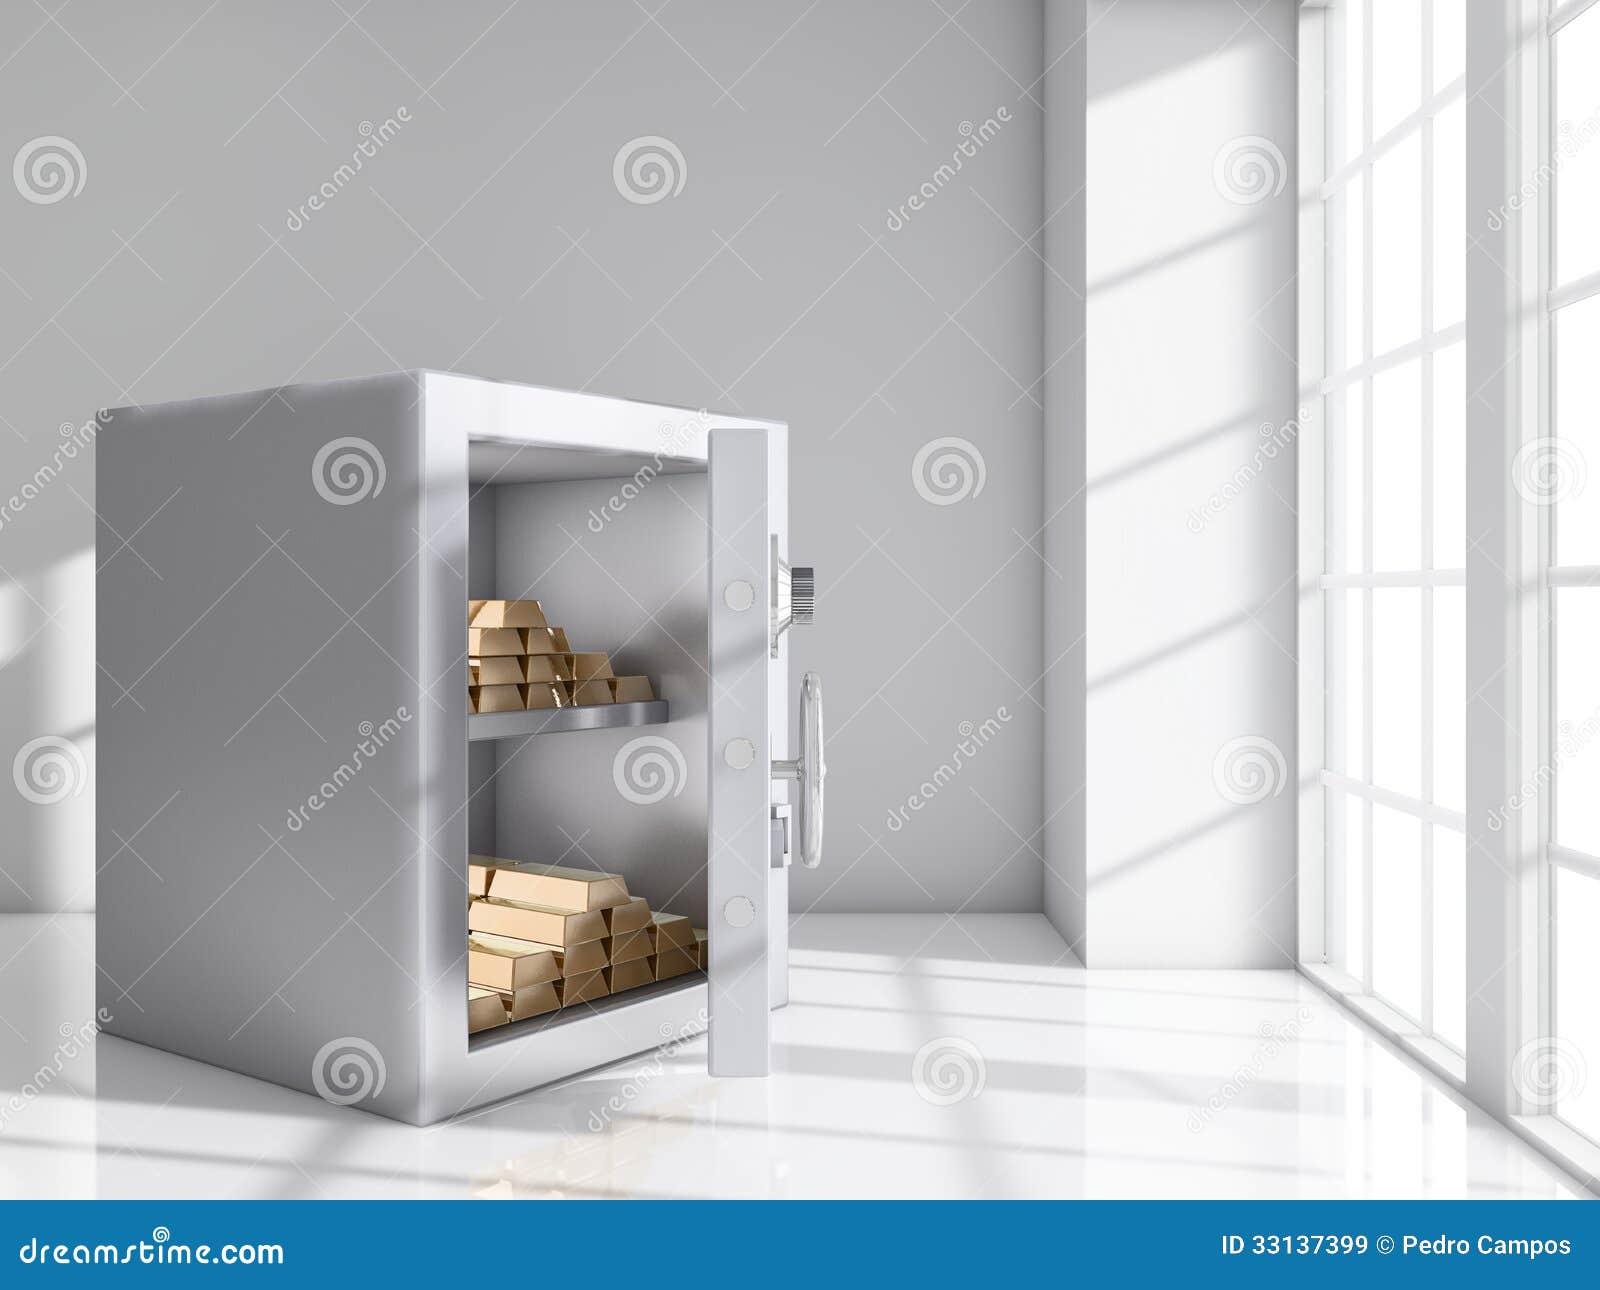 Safe room royalty free stock images image 33137399 for Buy safe room